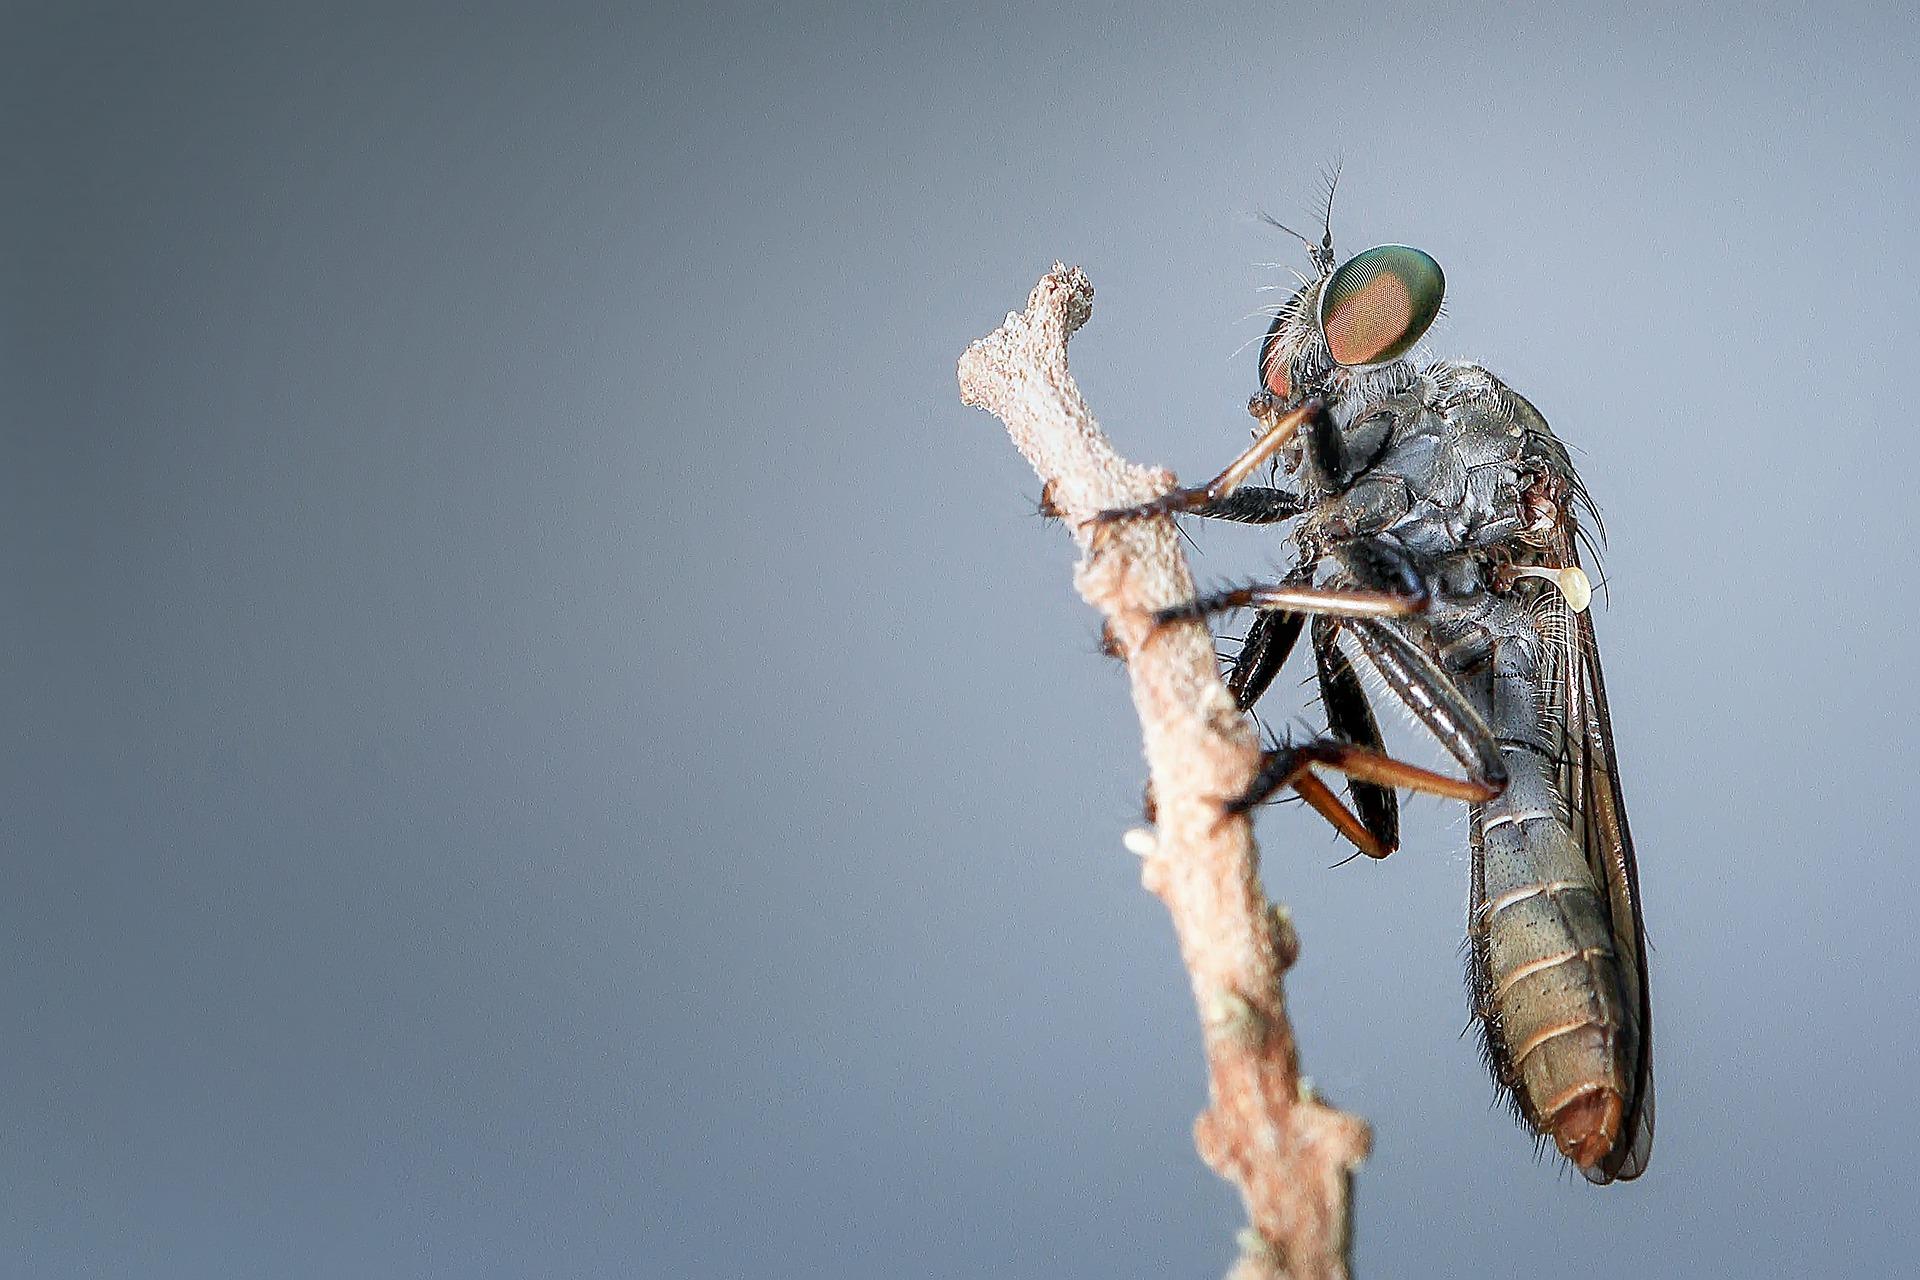 robberfly-1130469_1920